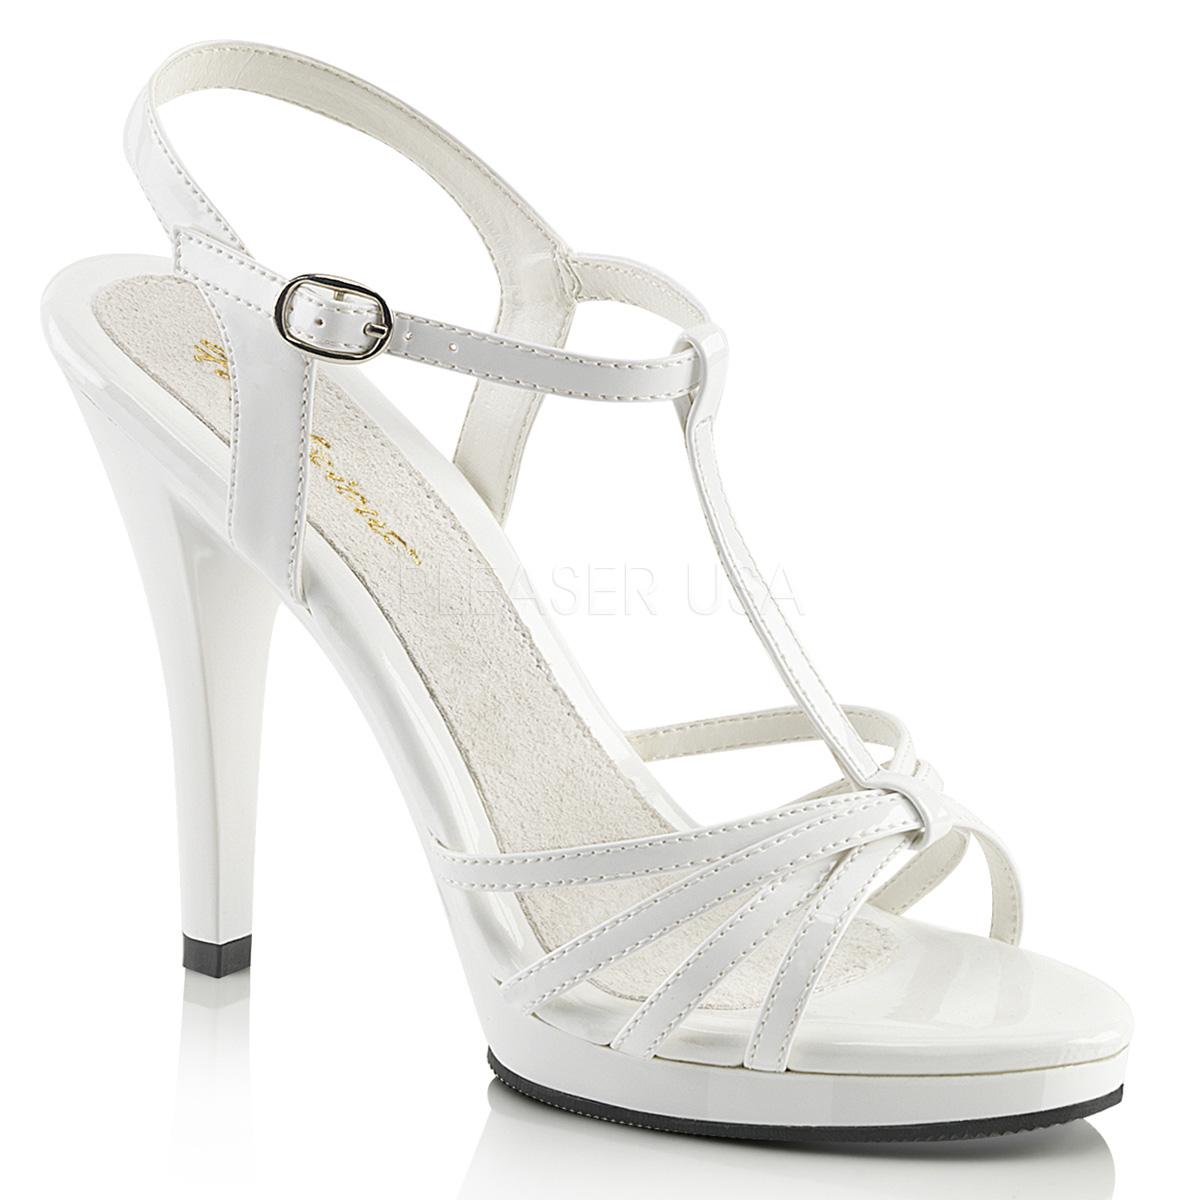 Sandales nu-pieds petit patin haut talon sexy e4f198c0b4dc